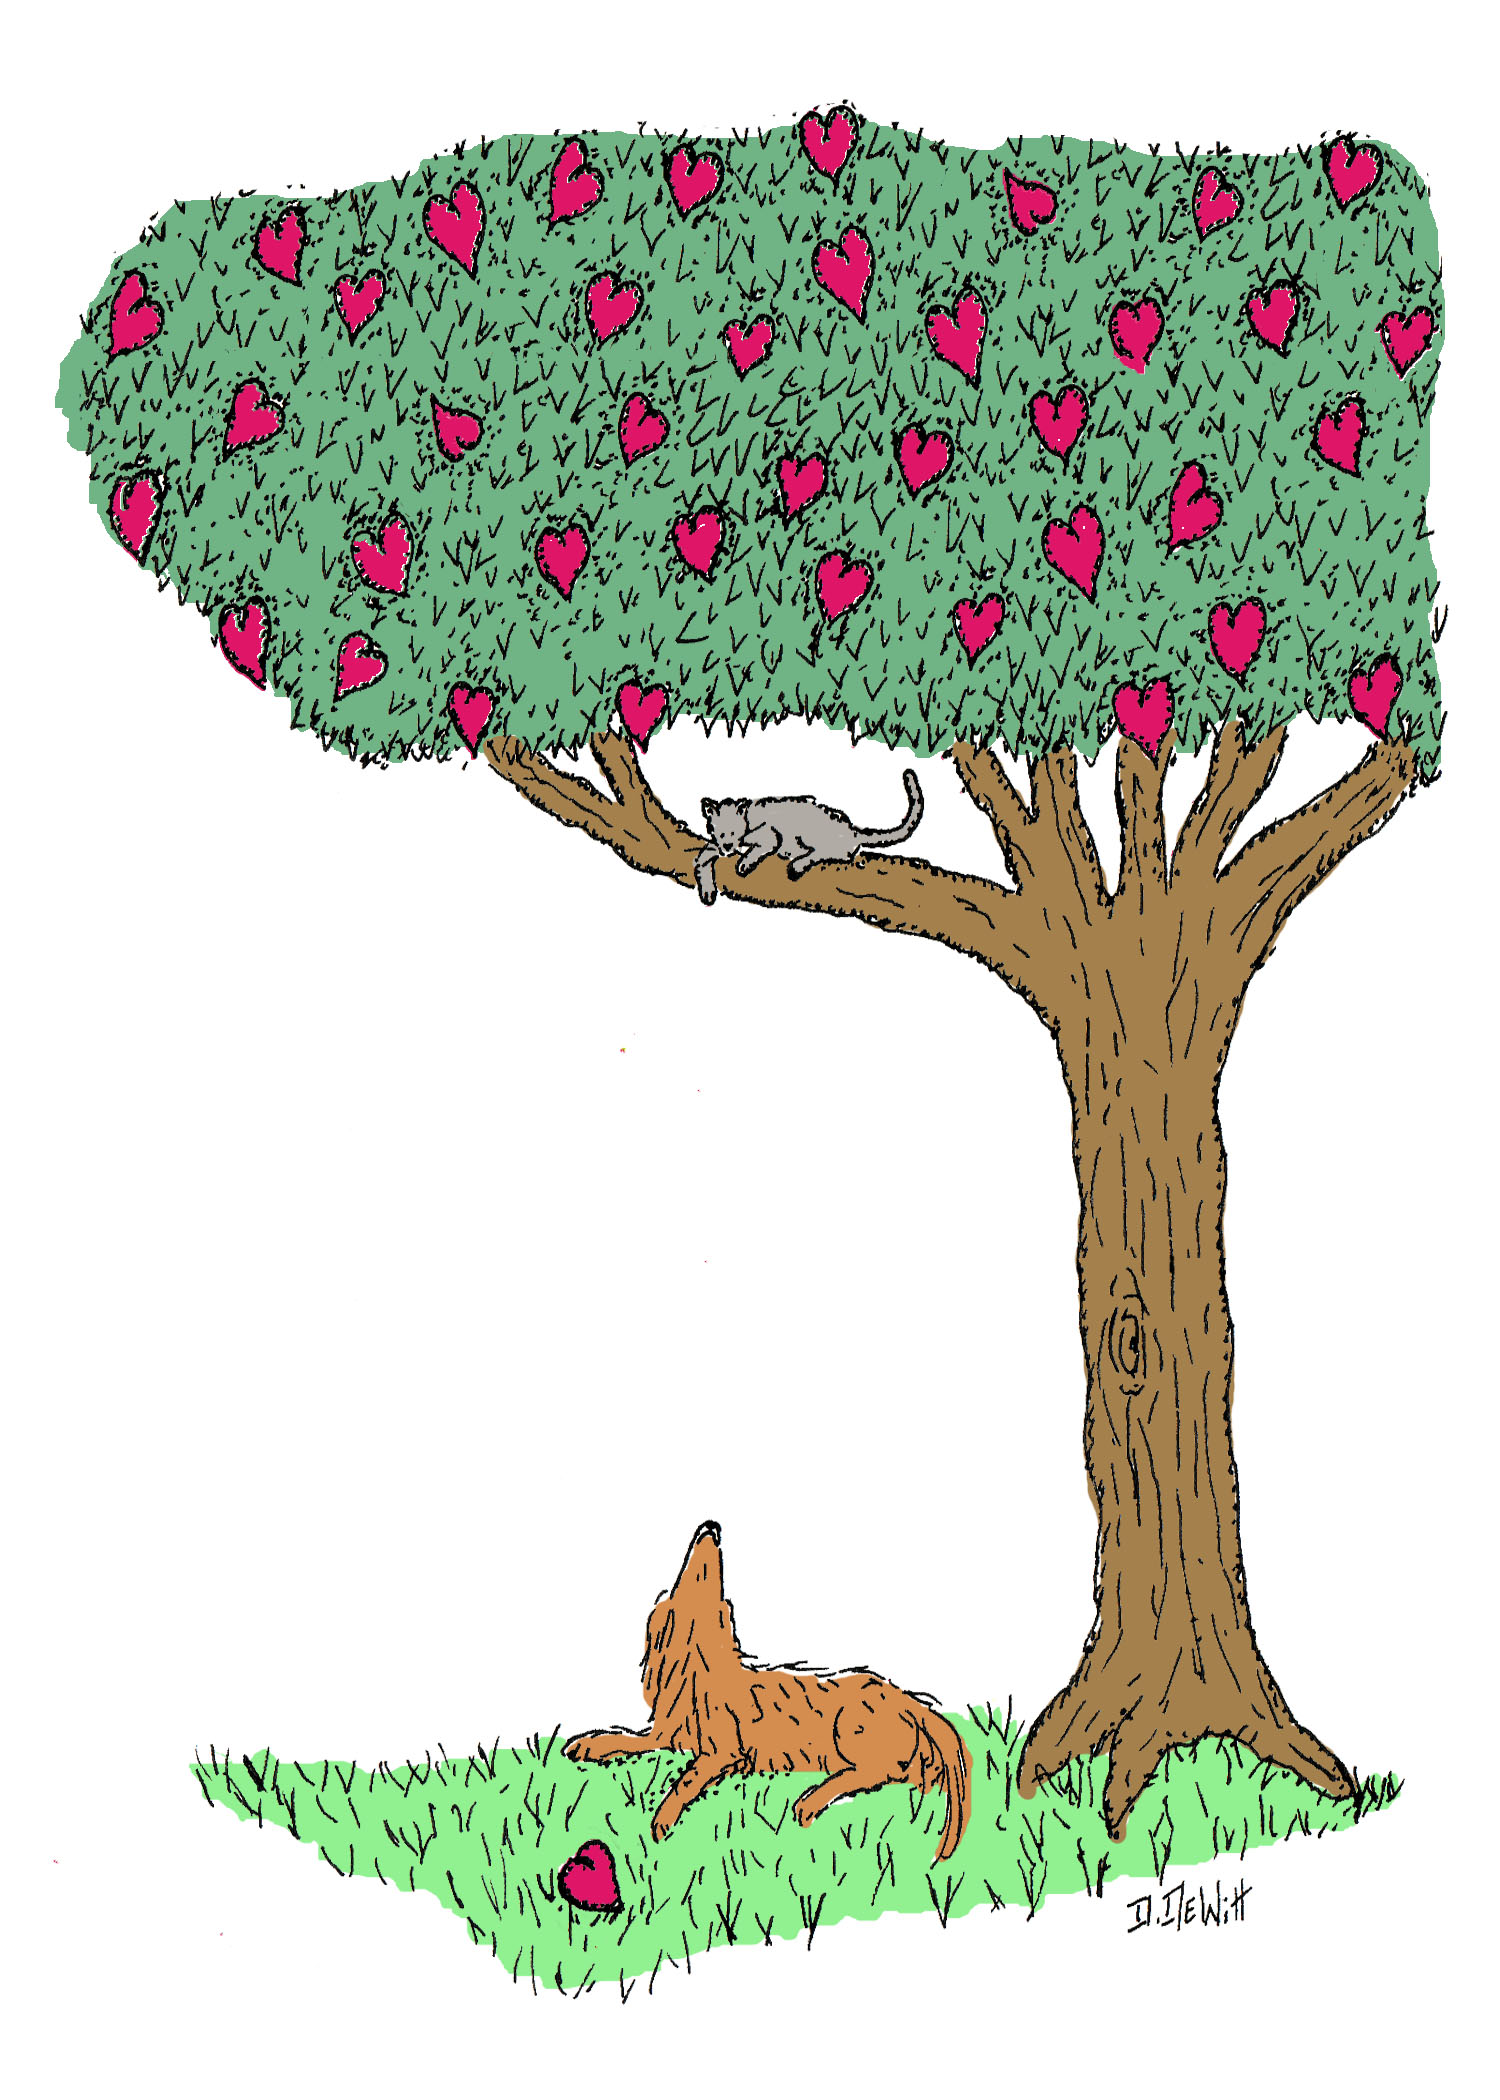 Heart Tree by David DeWitt